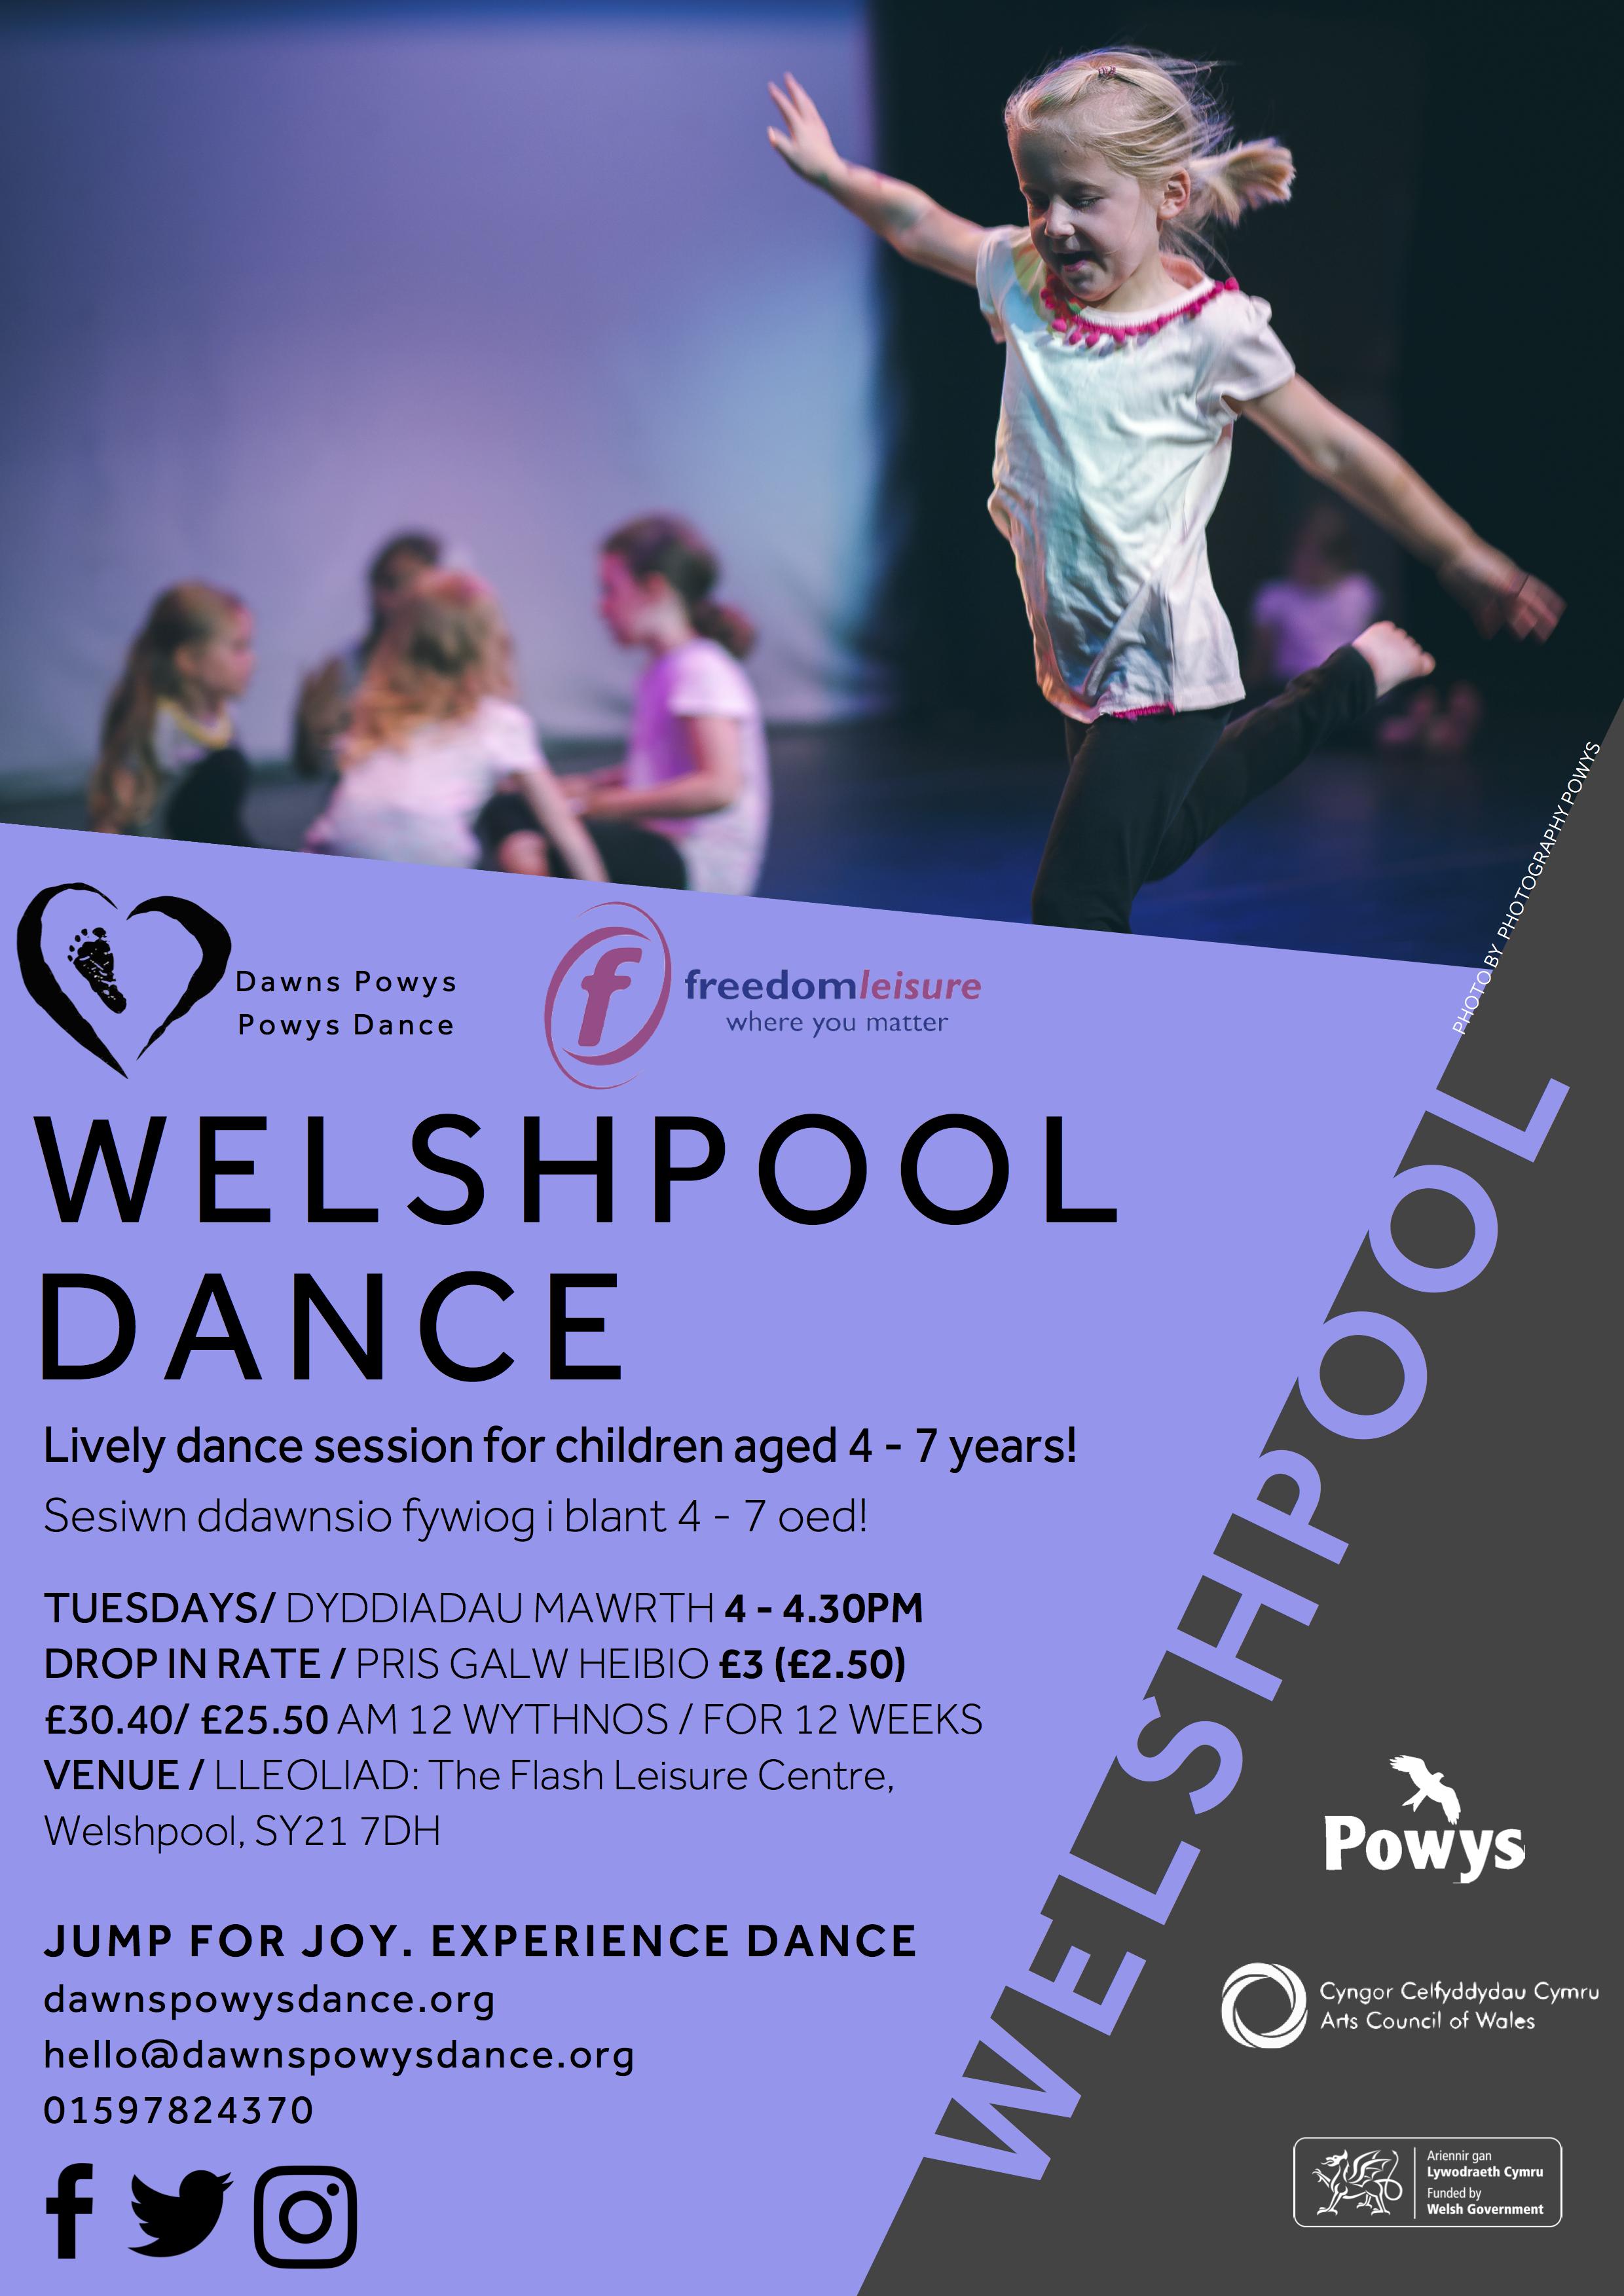 WELSHPOOL DANCE 2019 4 - 7 years.jpg